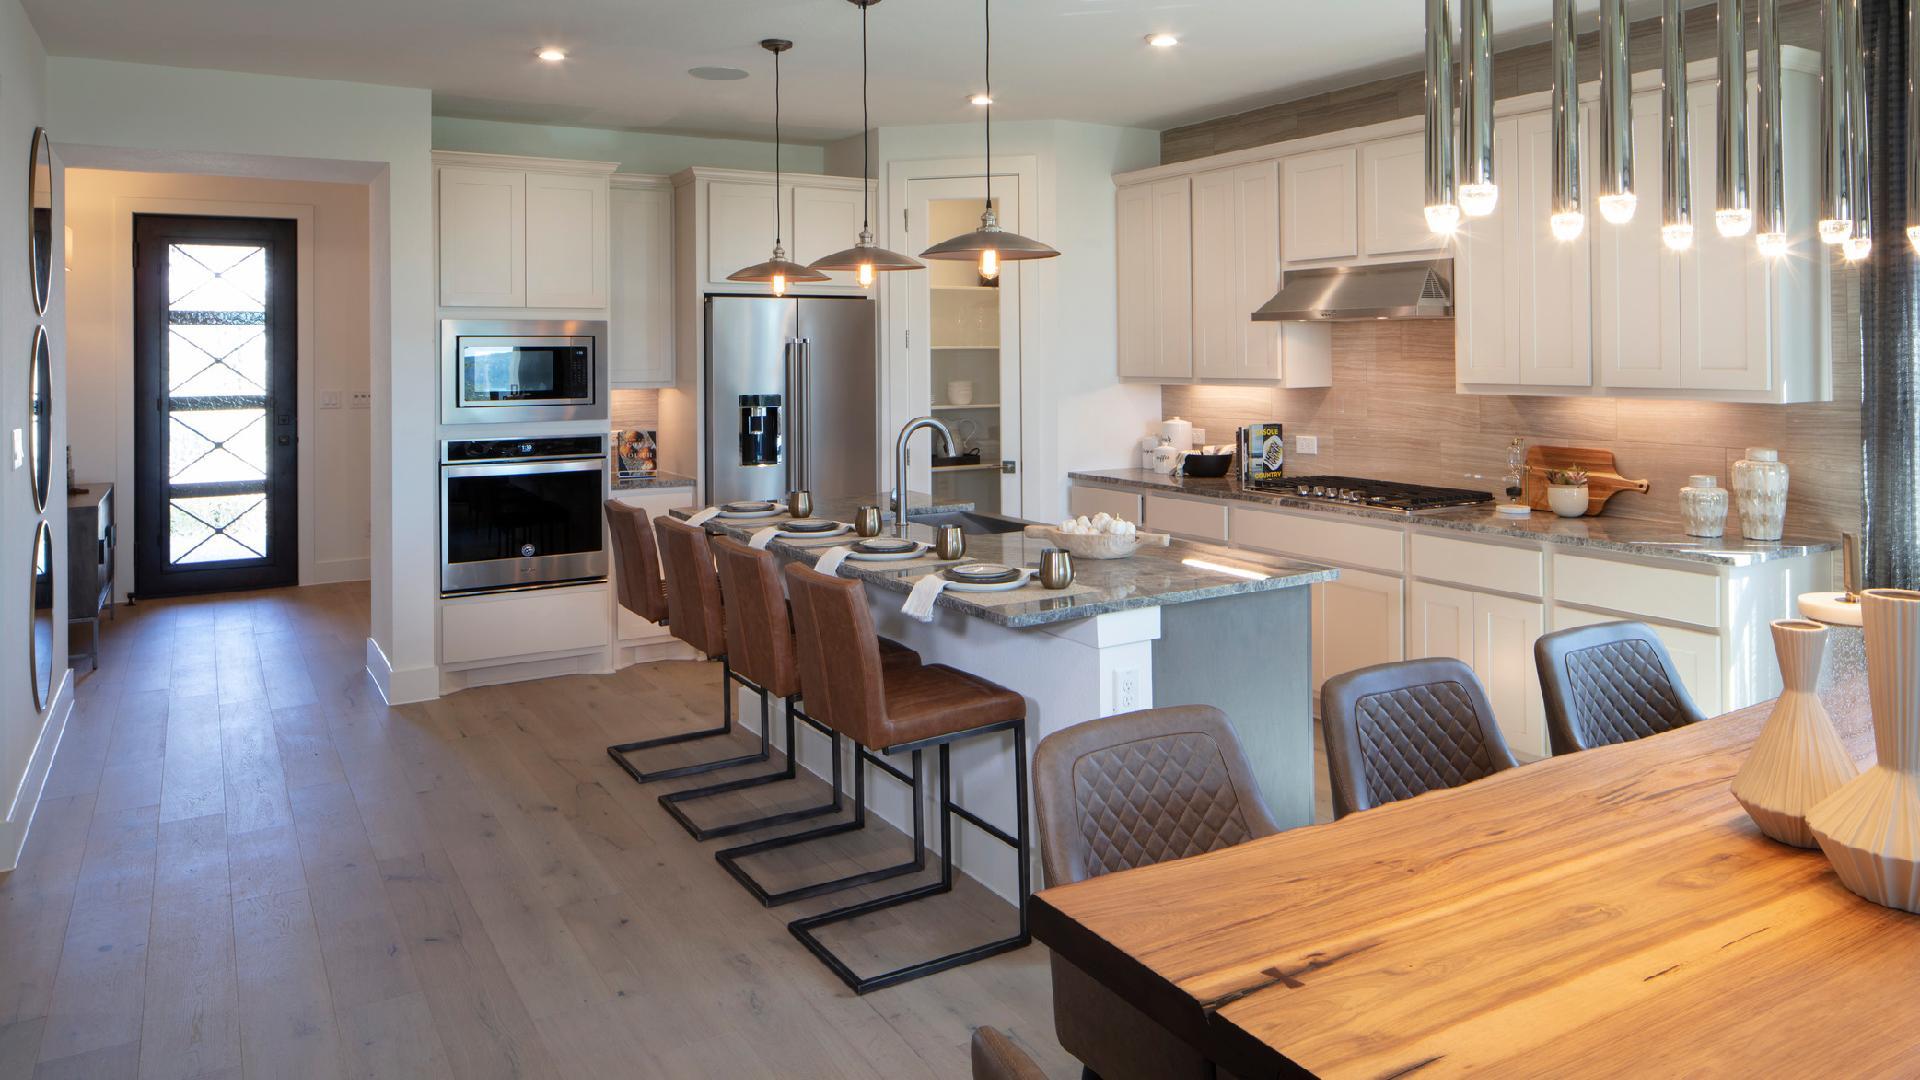 The well-designed Aiden kitchen